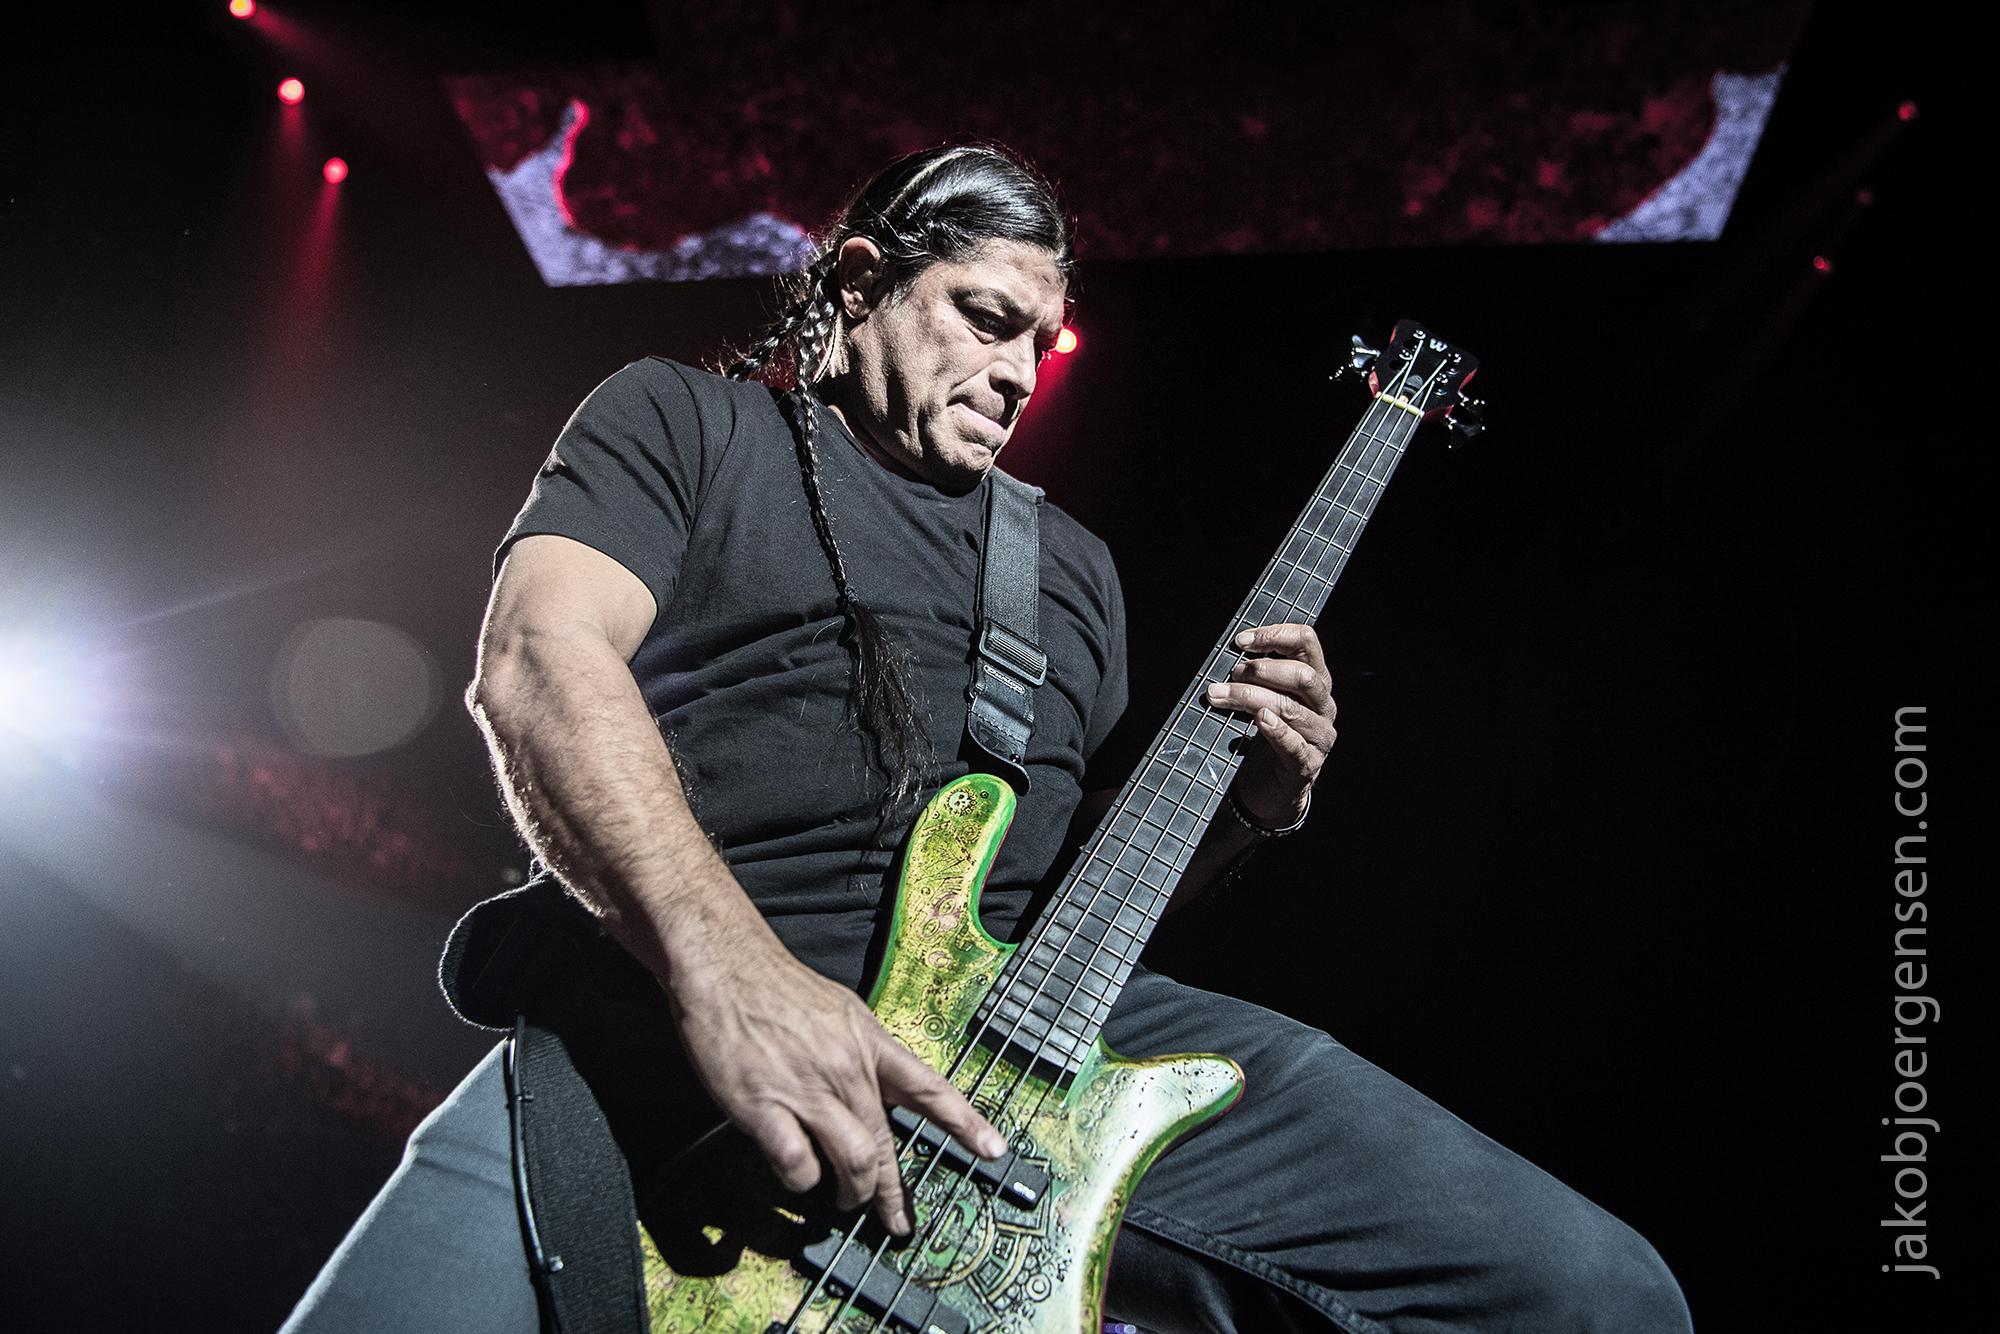 09-02-17_EB Metallica_0273.jpg